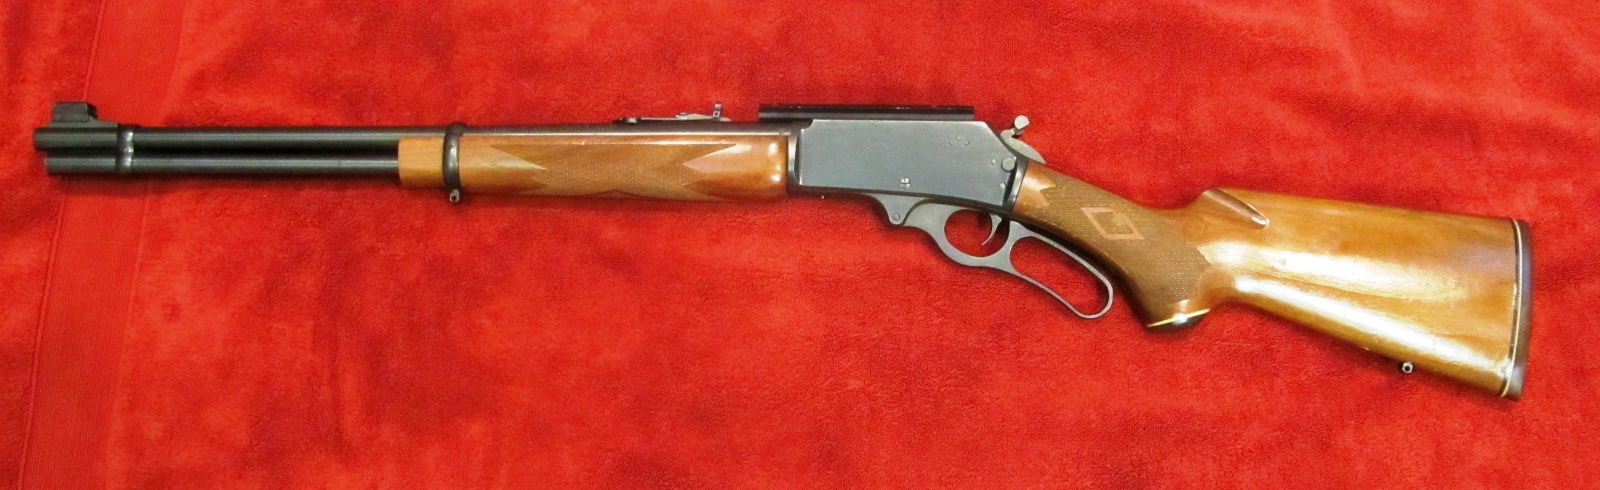 Marlin 336 35 remington in atlanta, Georgia gun classifieds ...